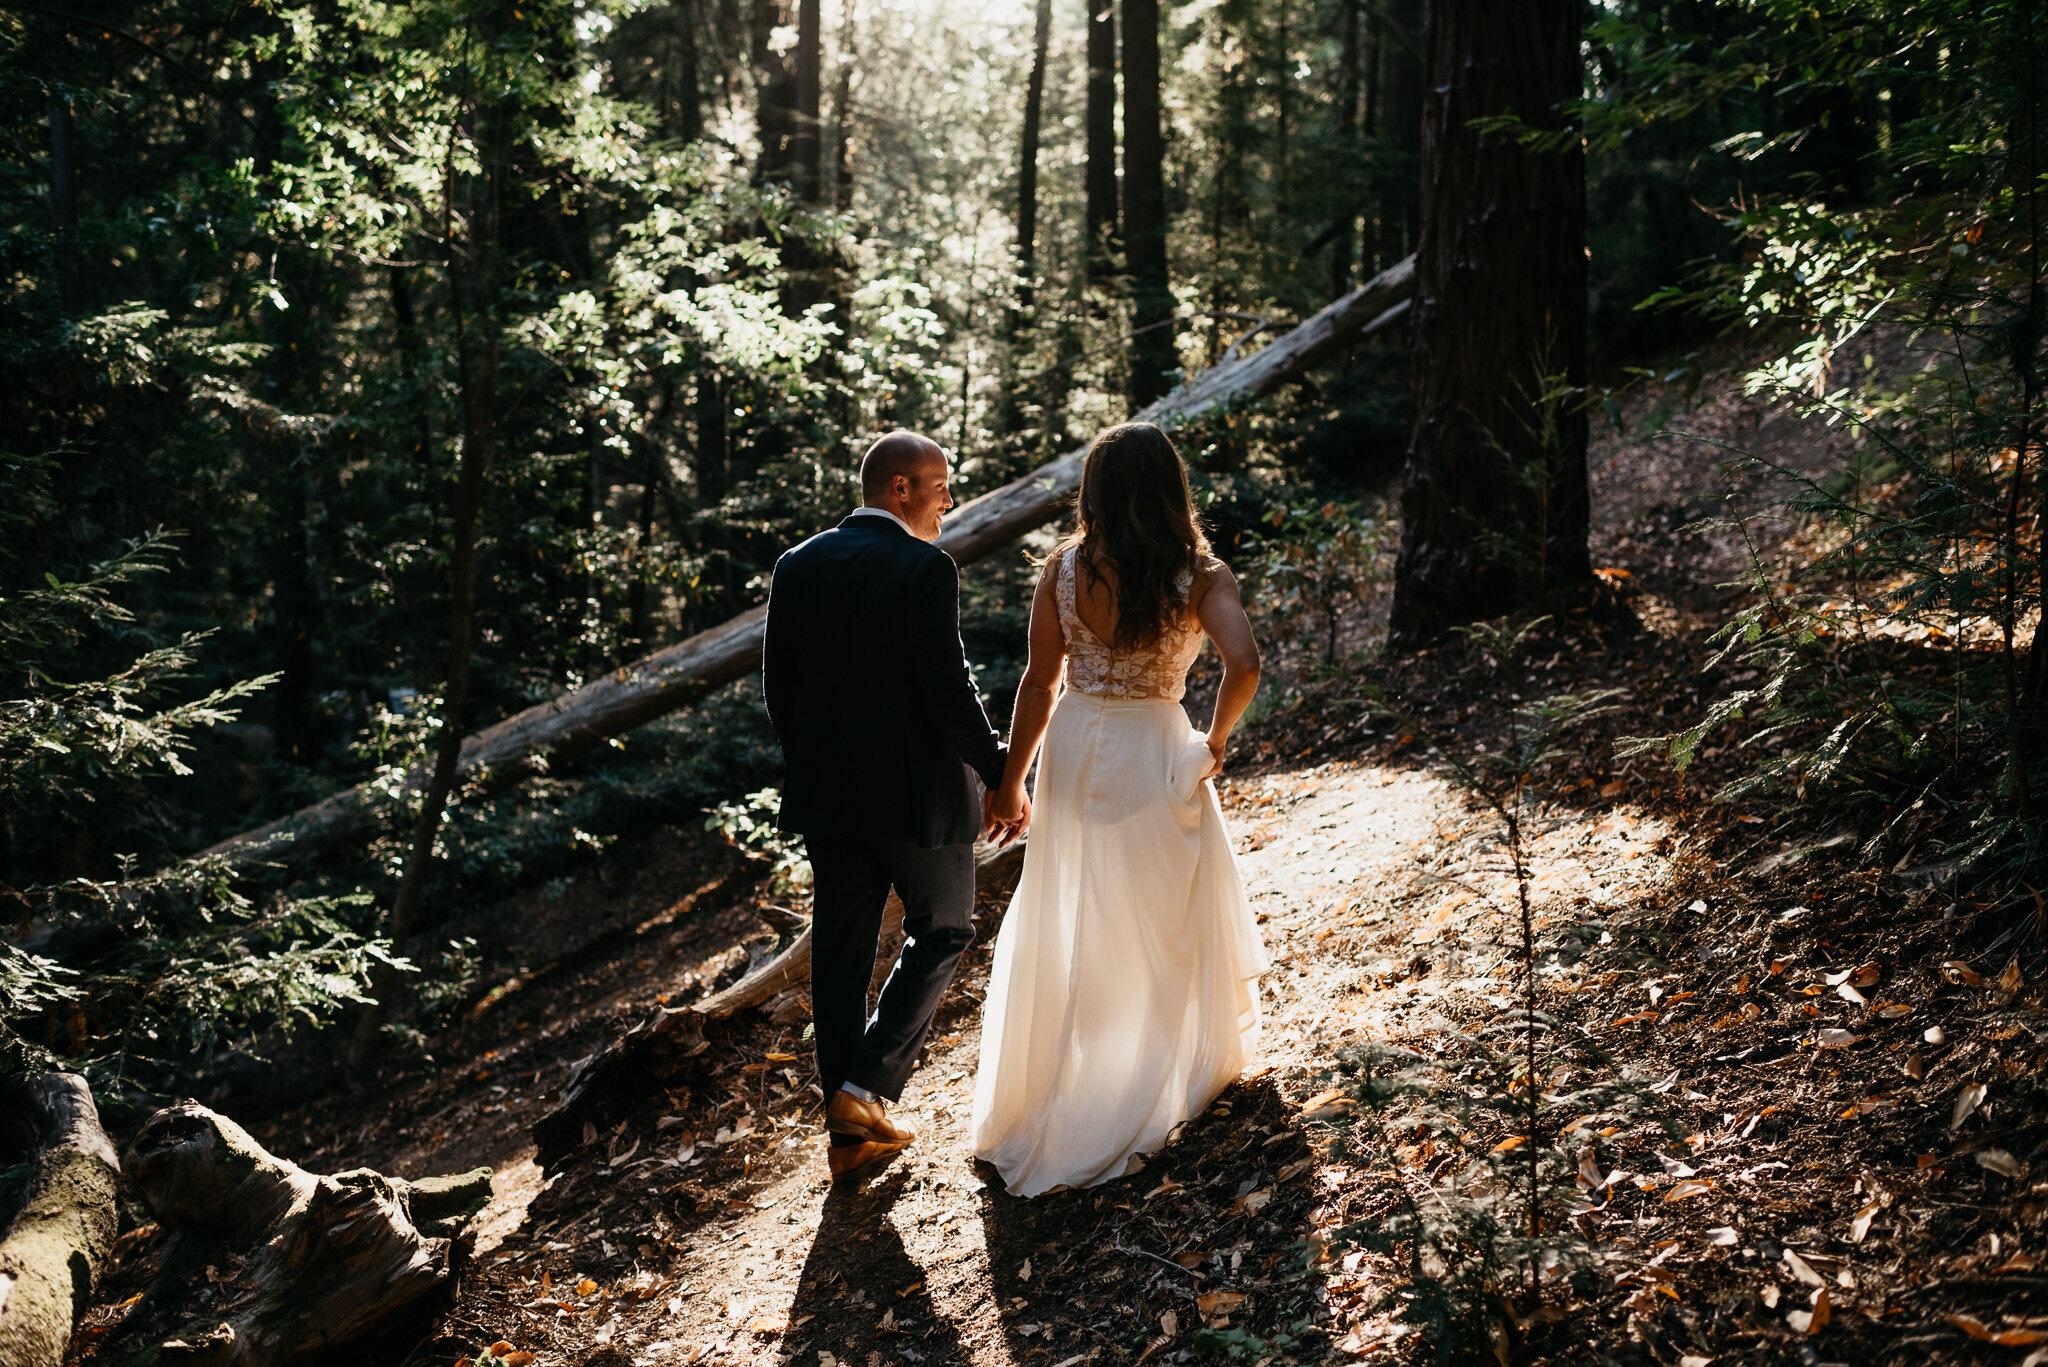 Cailfornia wedding photographer-14.jpg